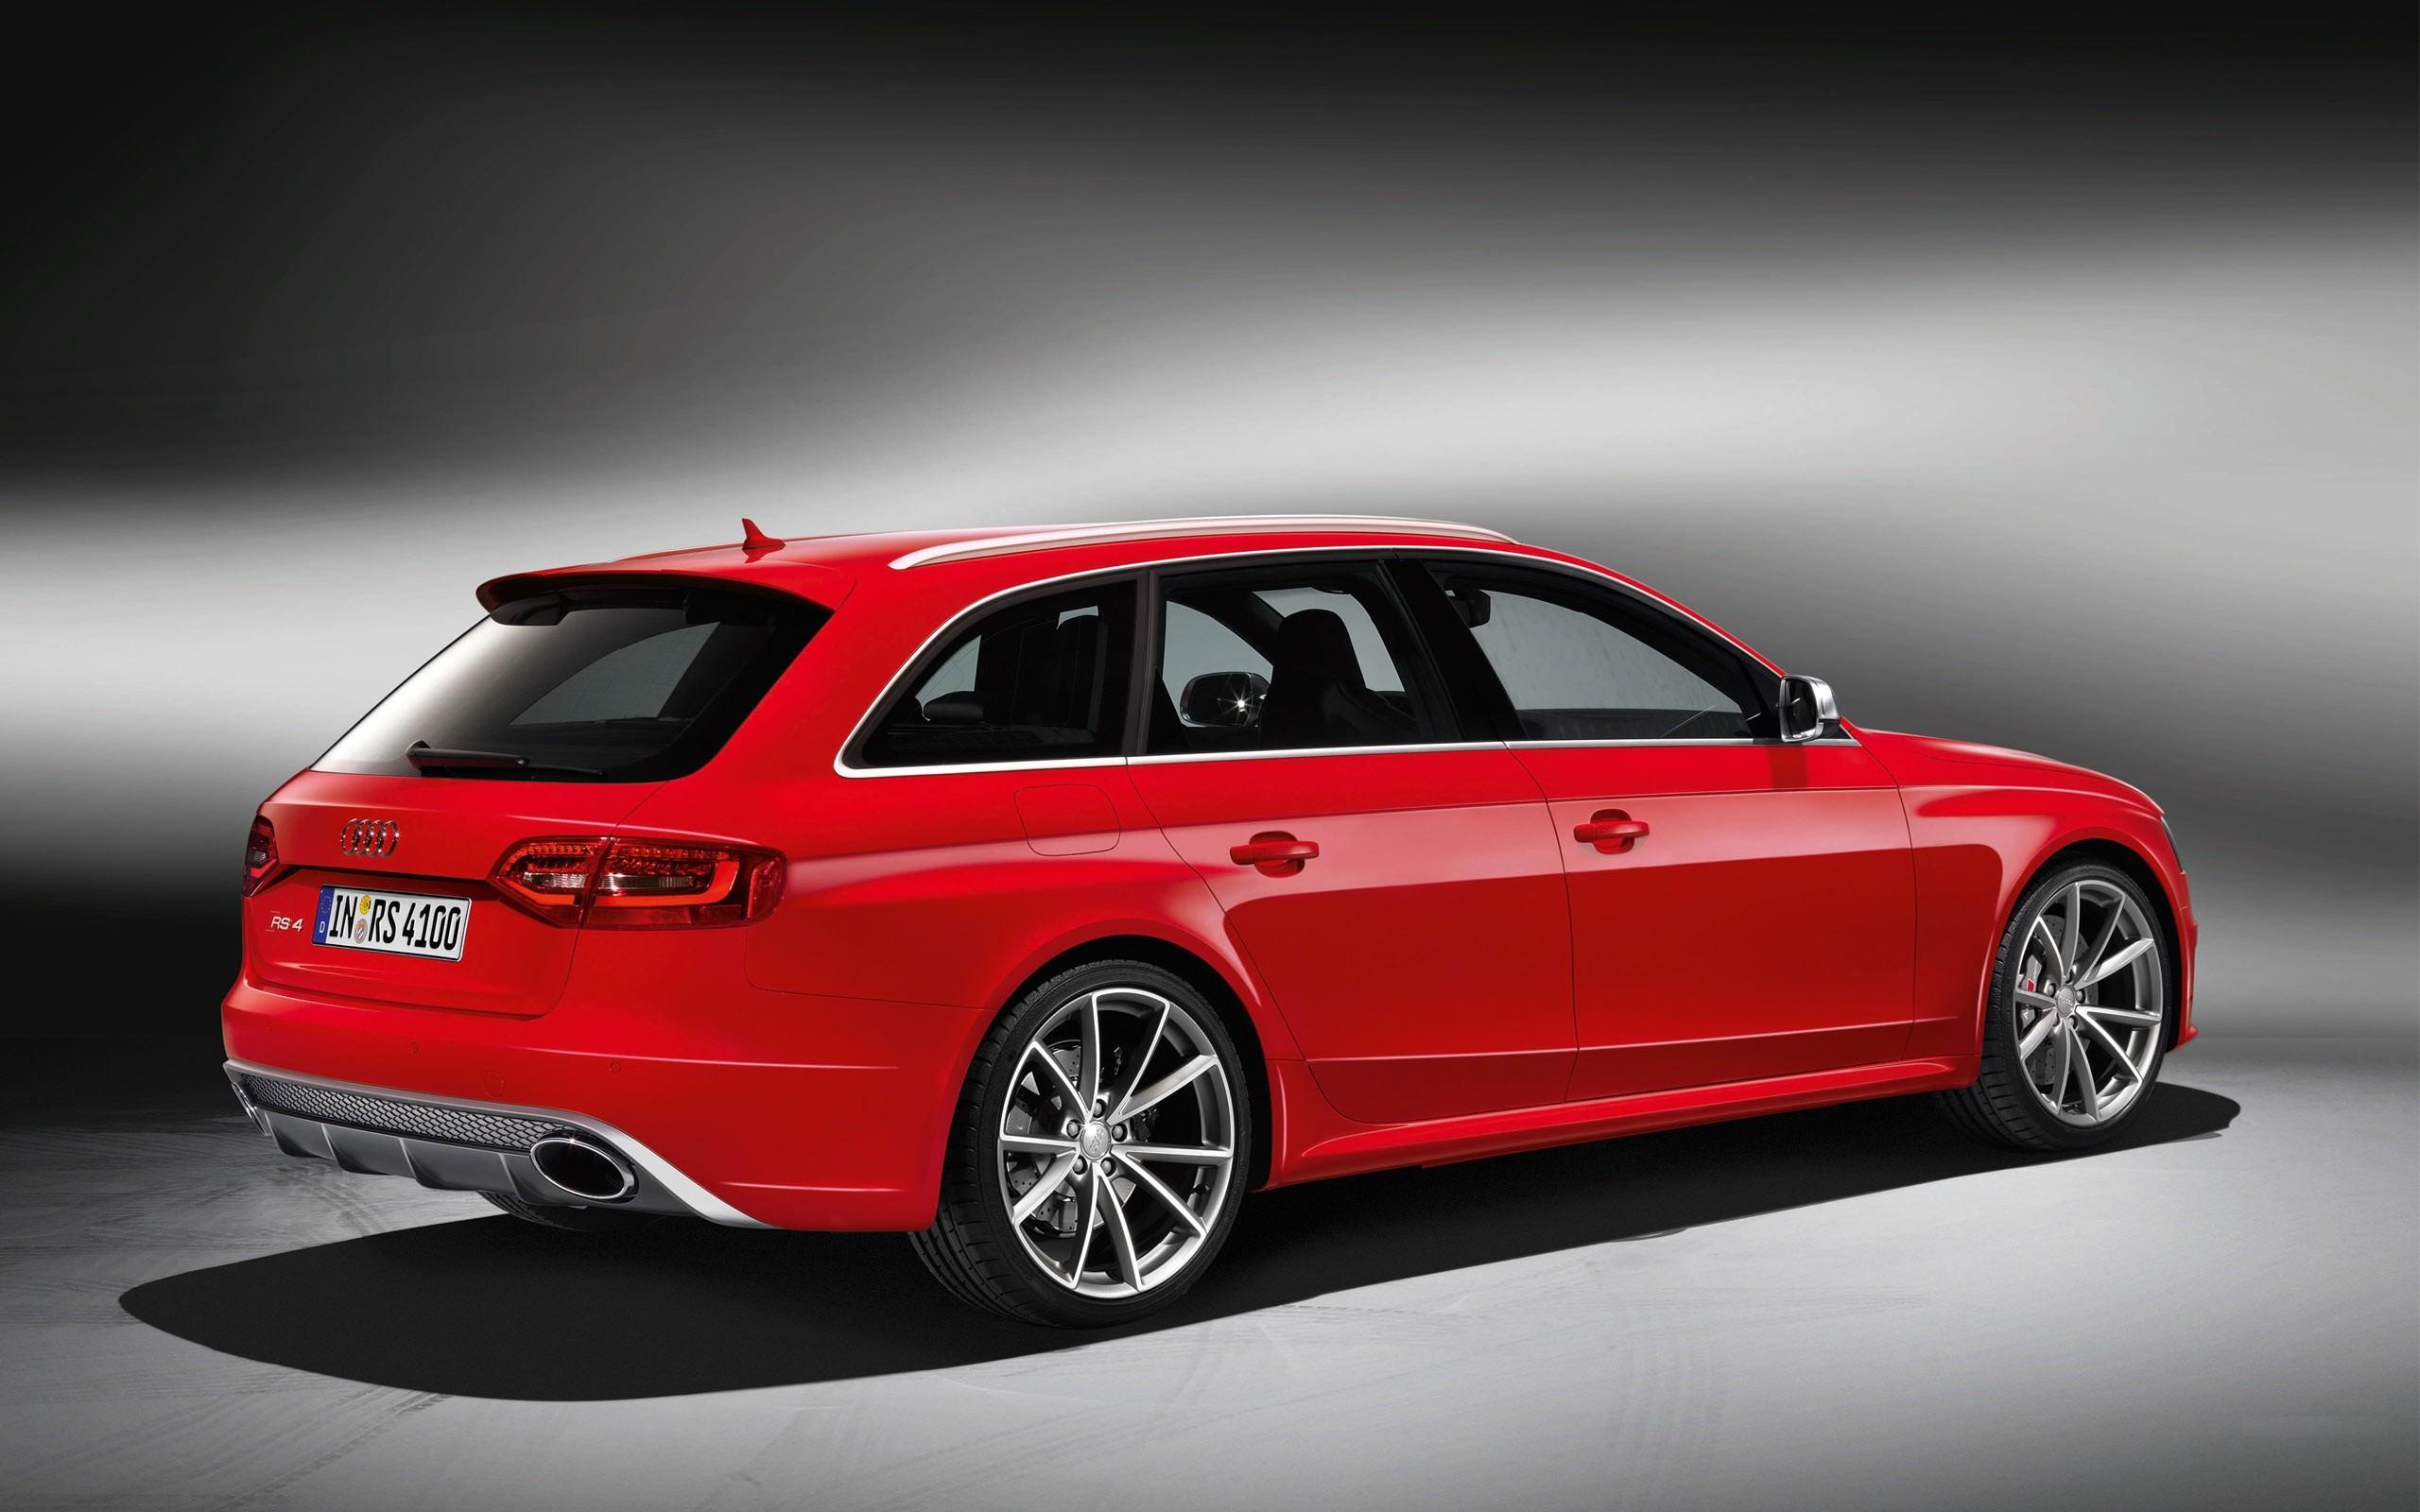 Red Cars Avant Vehicles Sports Cars Audi RS Wallpaper X - Audi car red